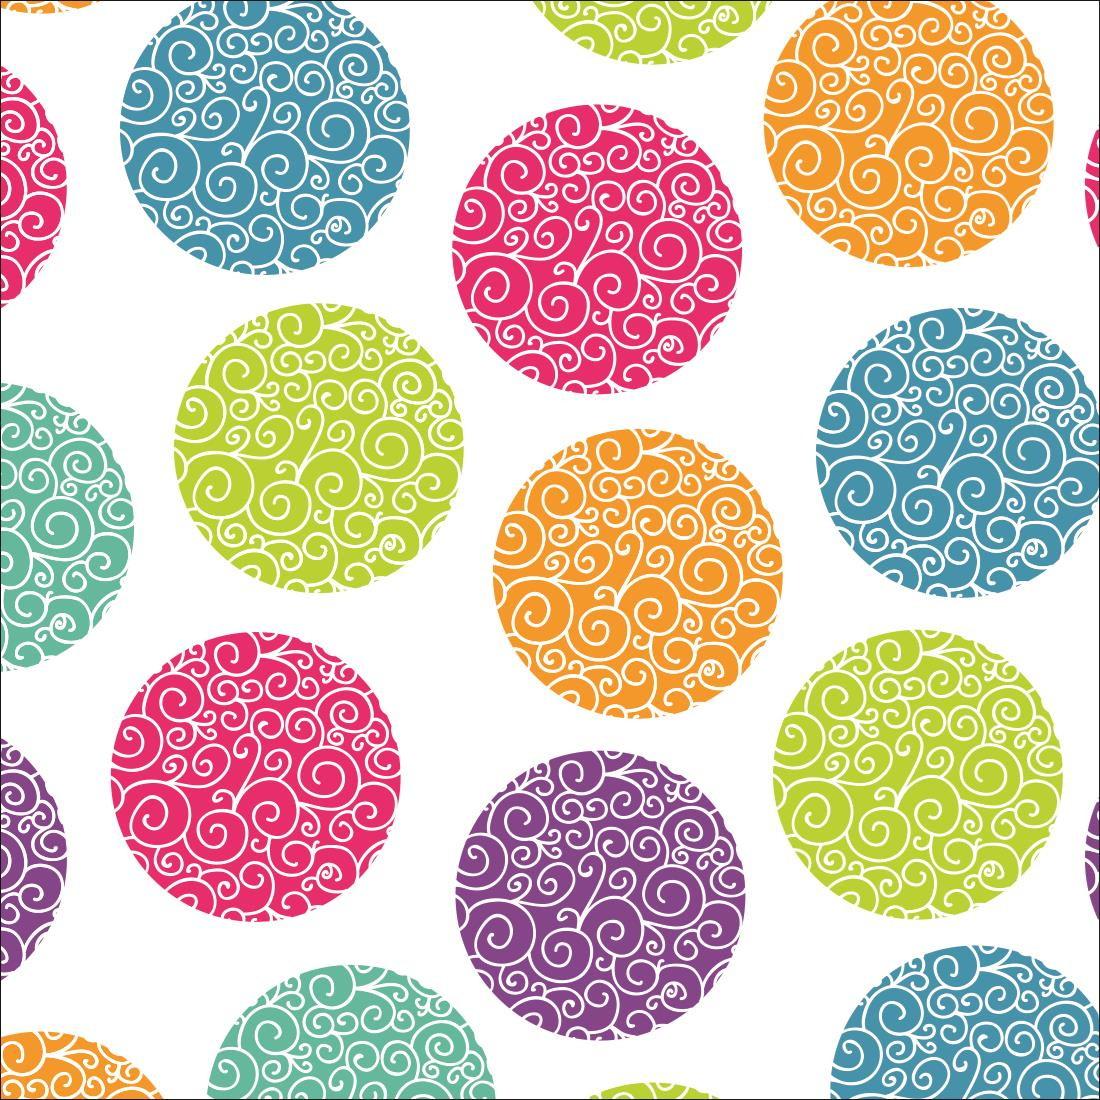 Papel de parede bolas coloridas decor 16 crie decore elo7 - Paredes de papel ...